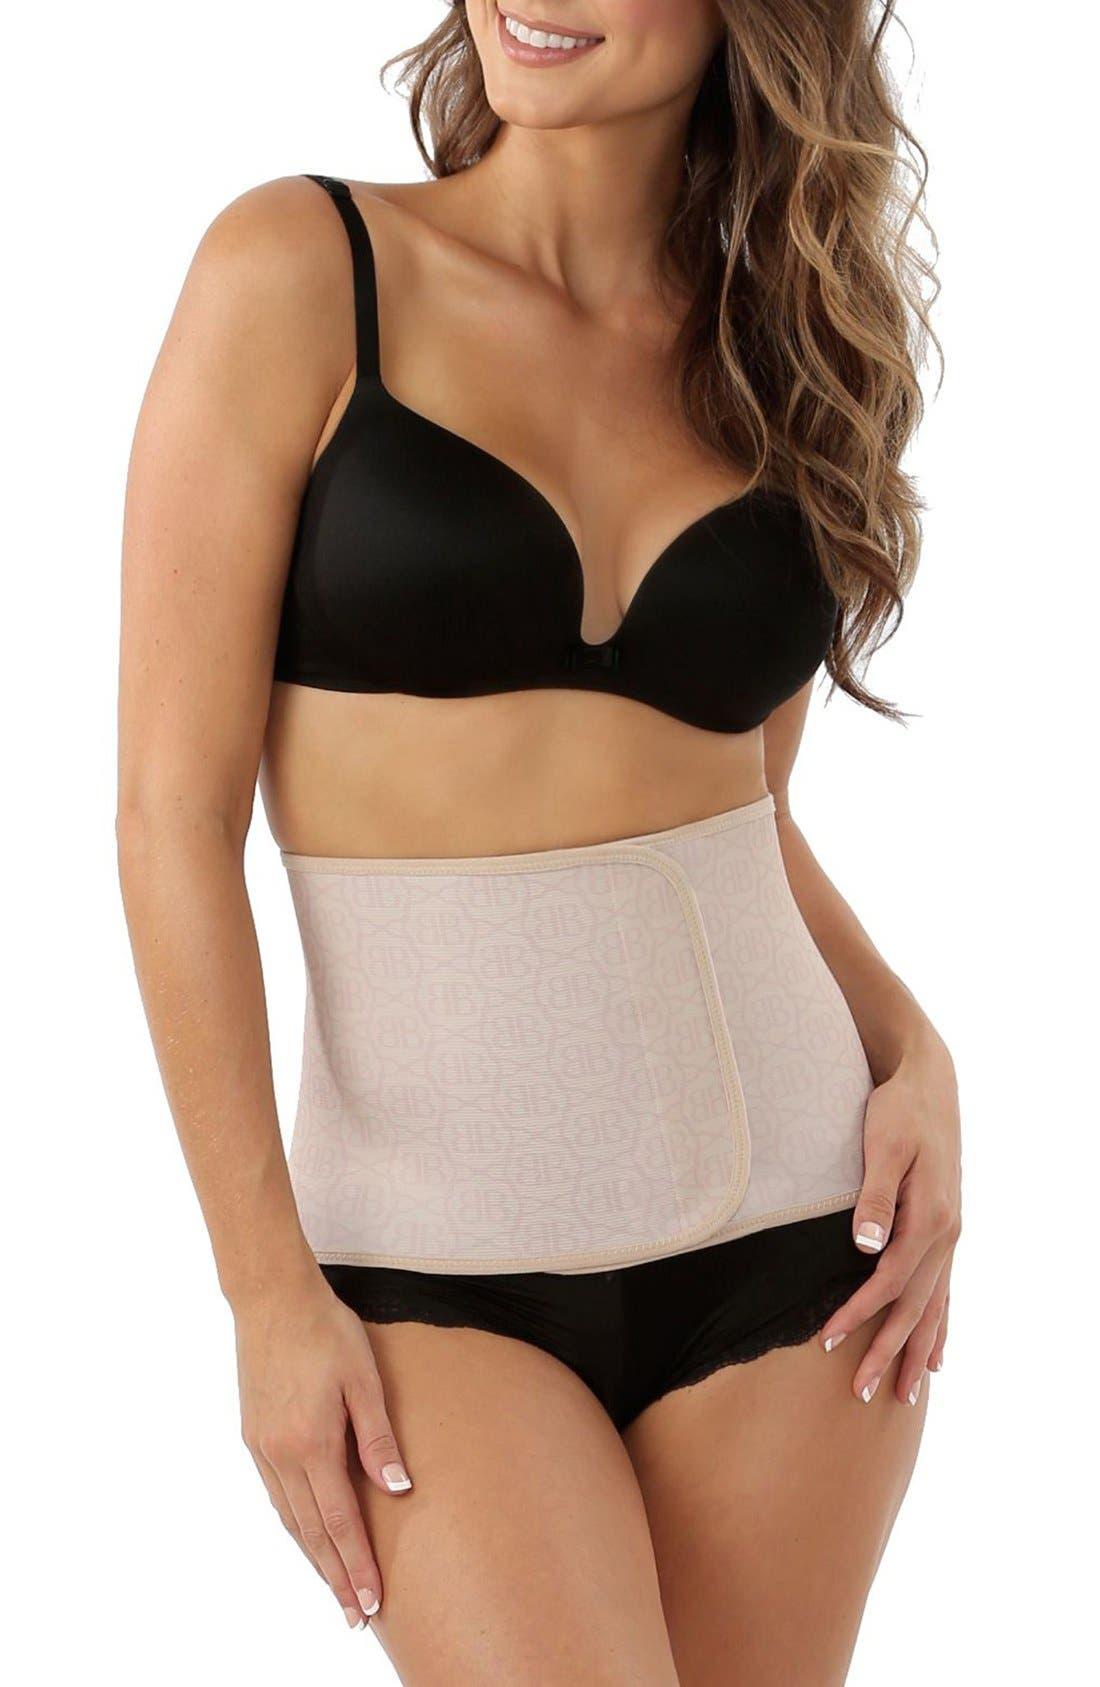 Belly Bandit® 'Original' Post-Pregnancy Belly Wrap